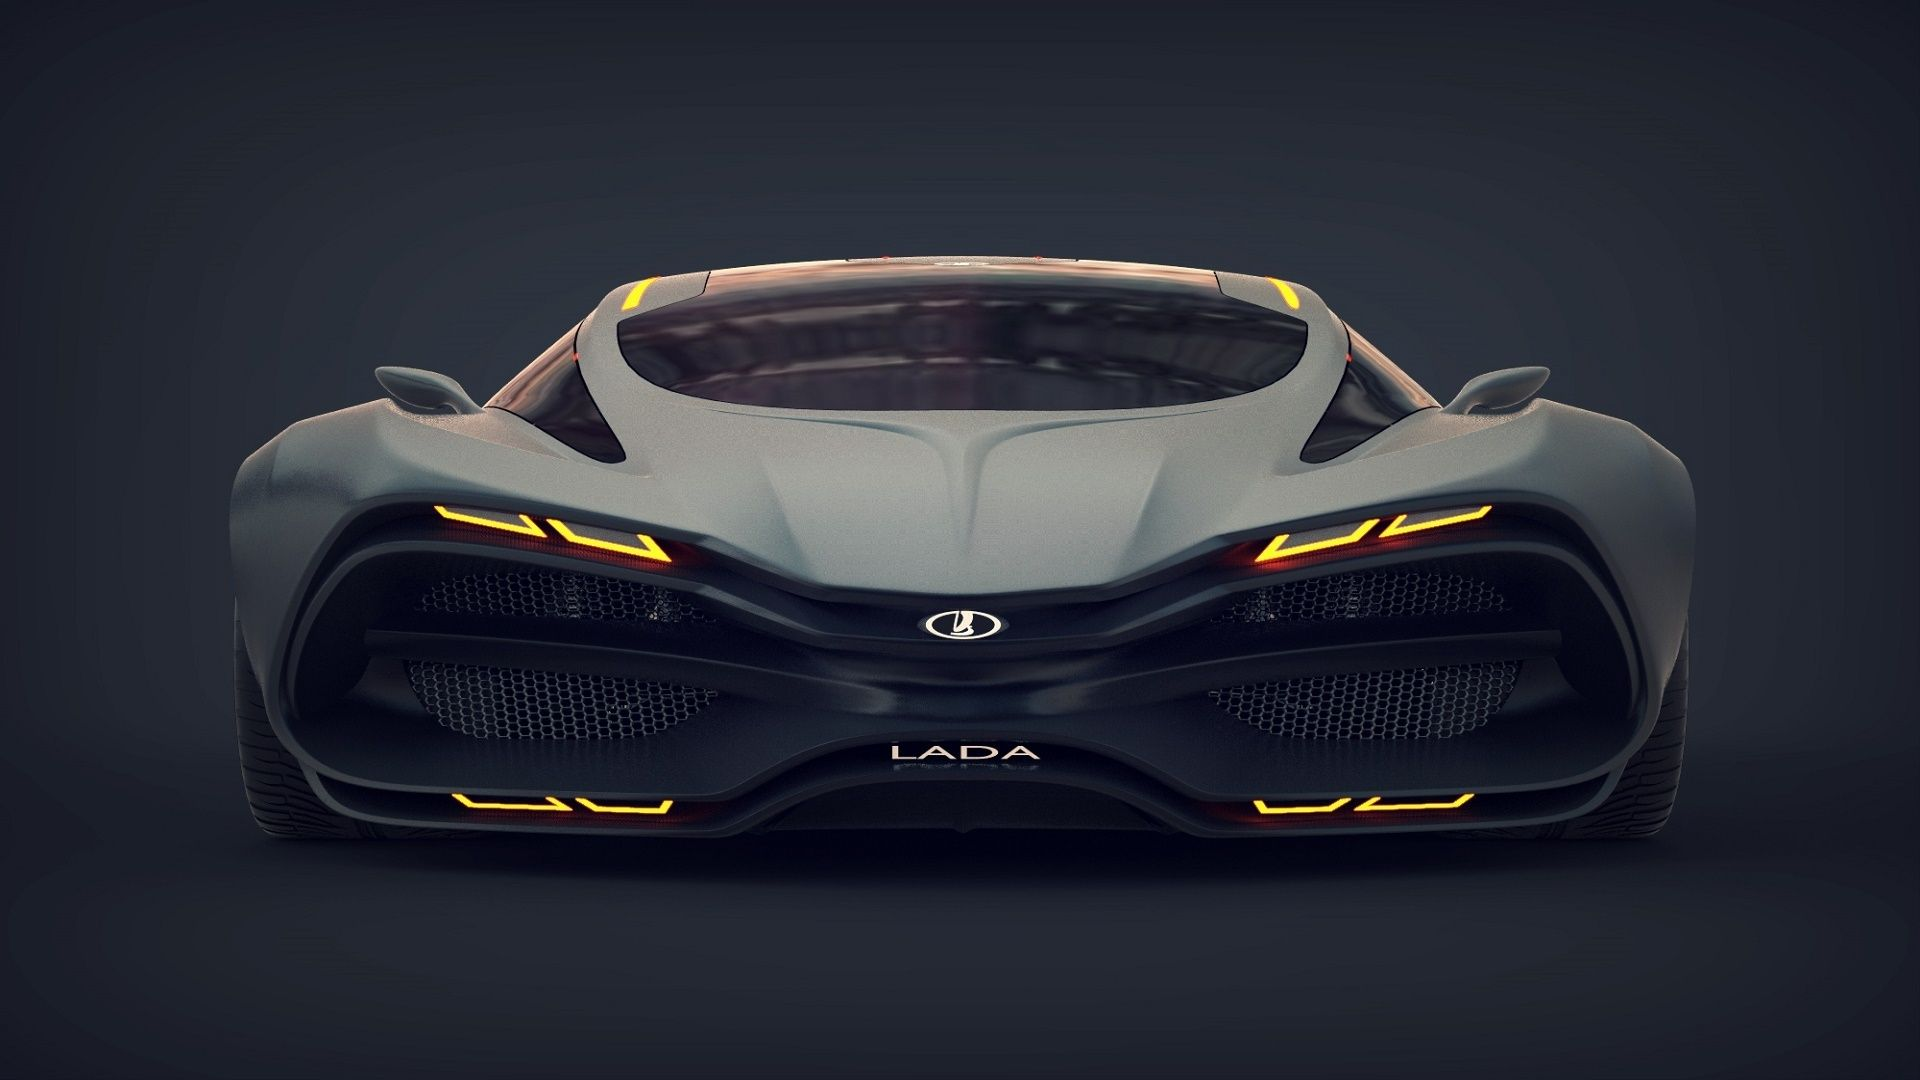 Lada Raven Wallpapers 1080p Super Cars Concept Cars